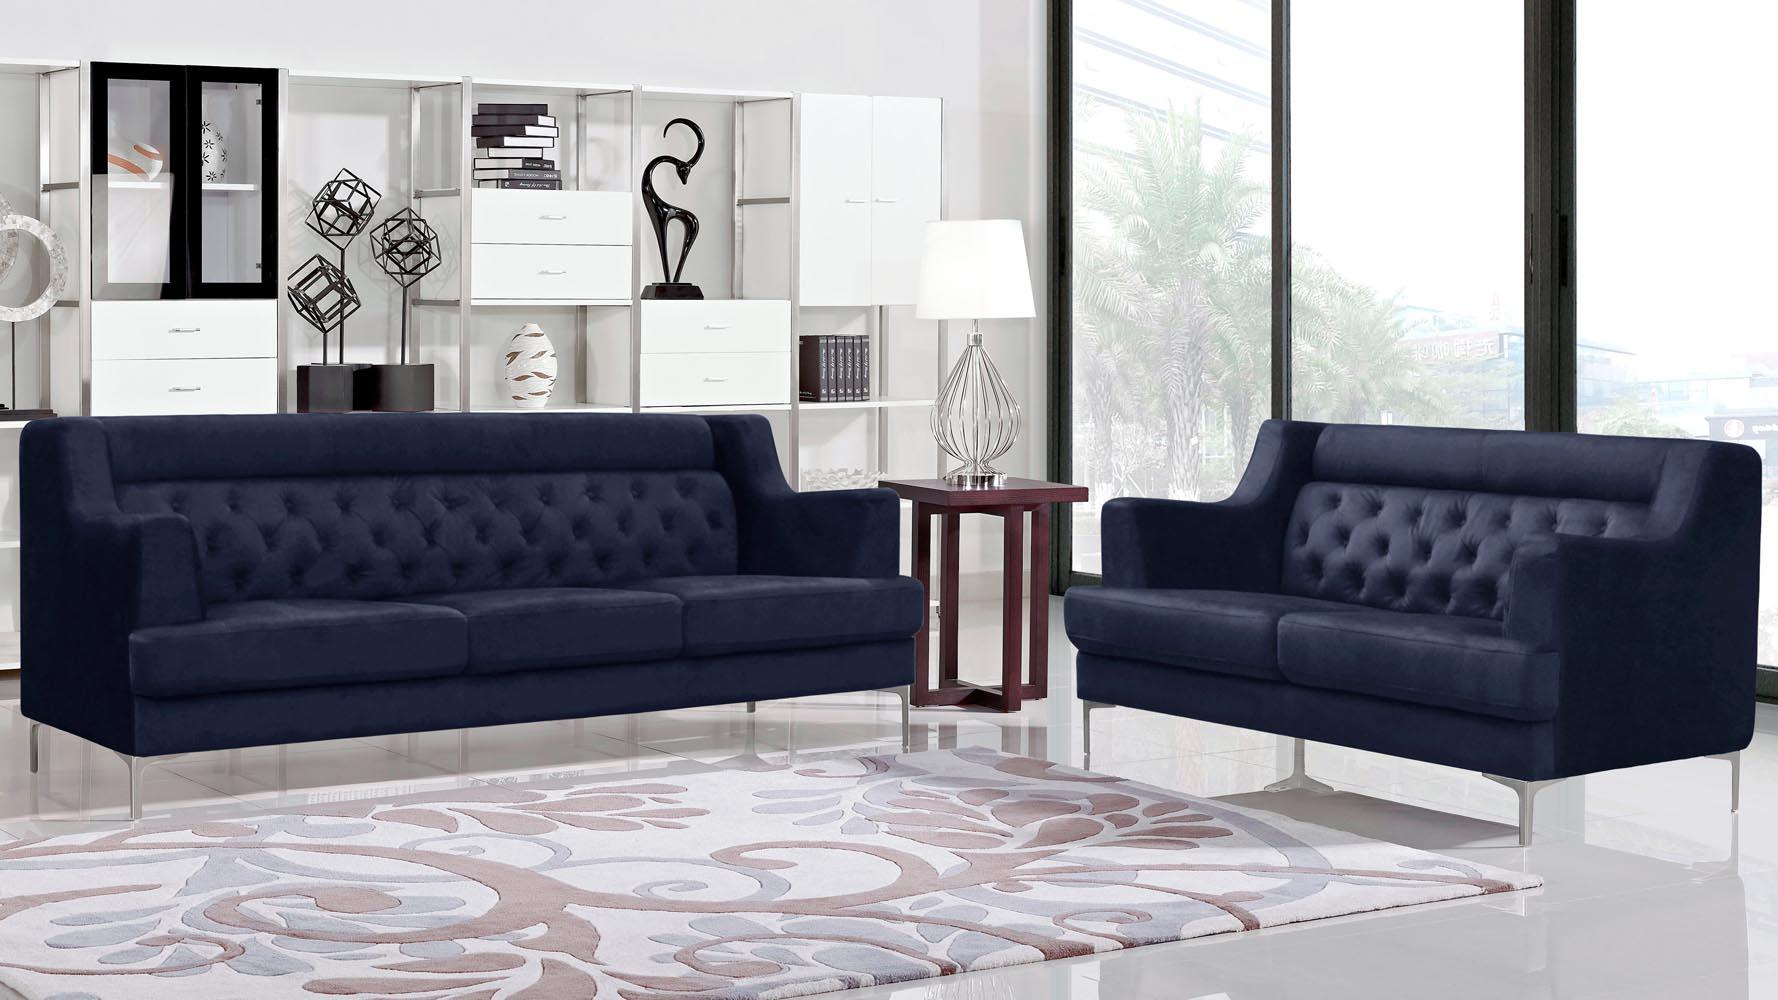 Finest Zara Fabric Tufted Sofa with Chrome Legs - Navy Blue | Zuri Furniture HM91